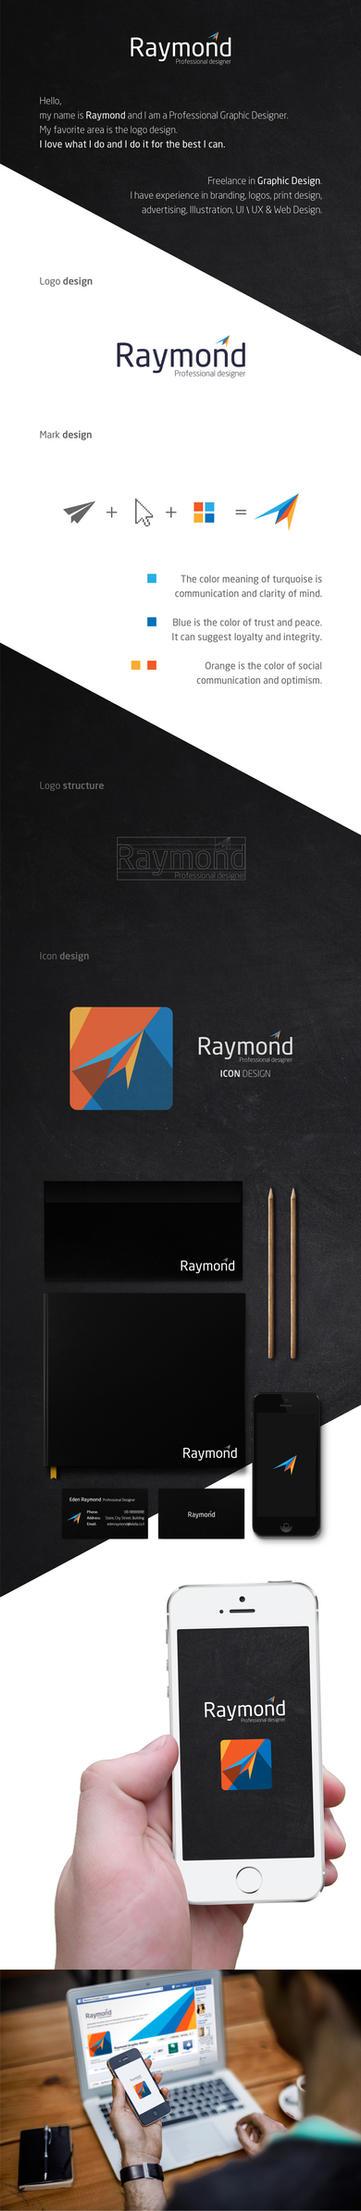 Raymond - Rebranding Project by RaymondGD